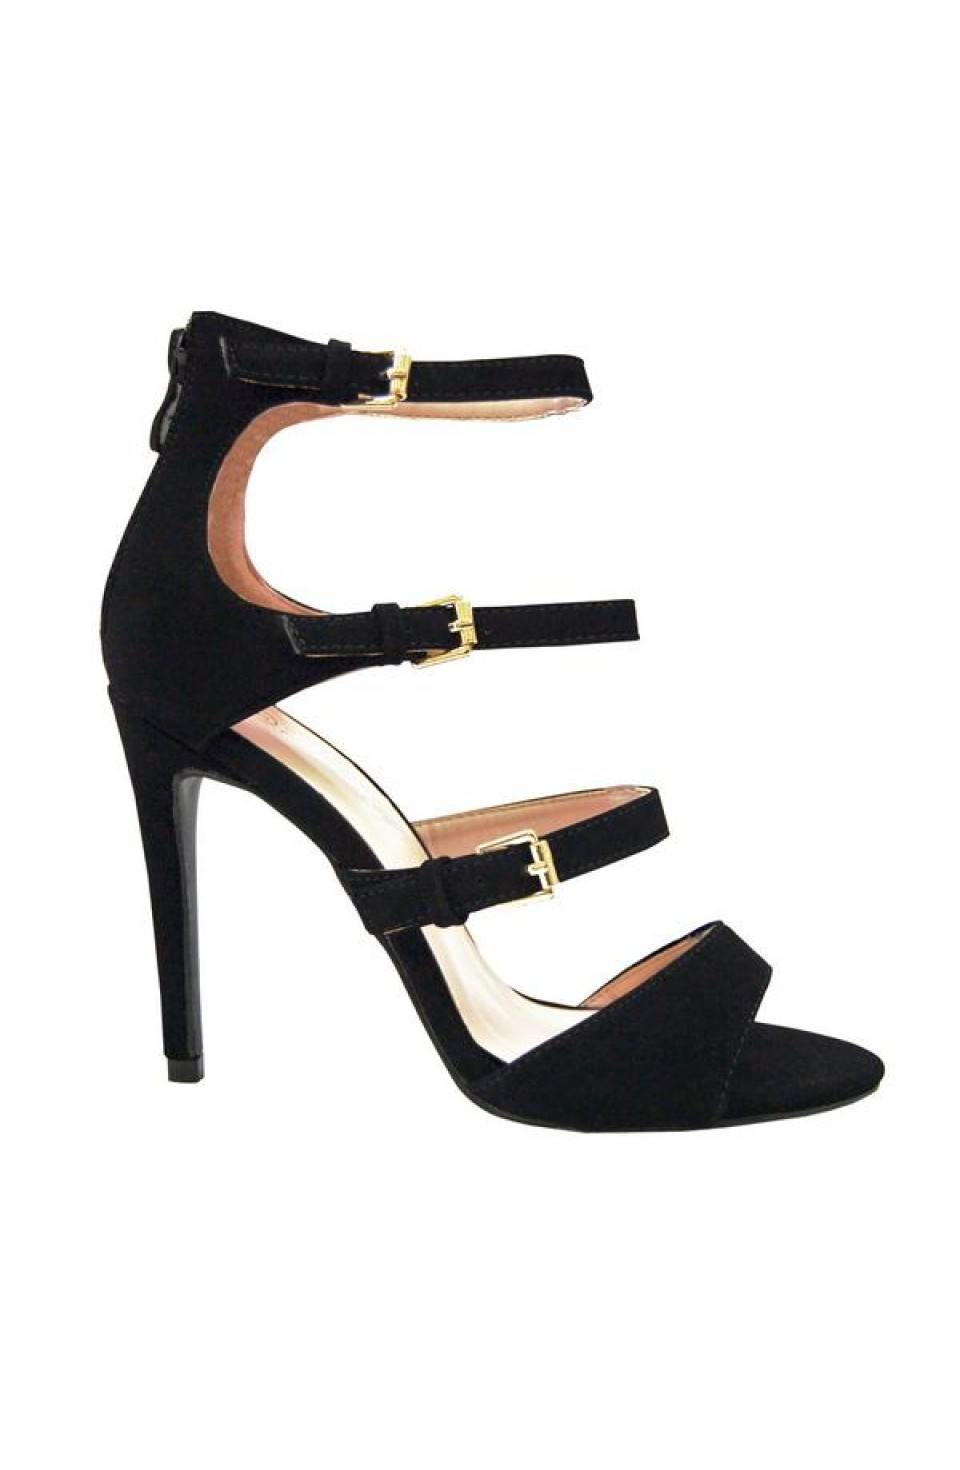 Women's Black Sgiselle 4-inch Heeled Sandal with Triple Buckle Strap